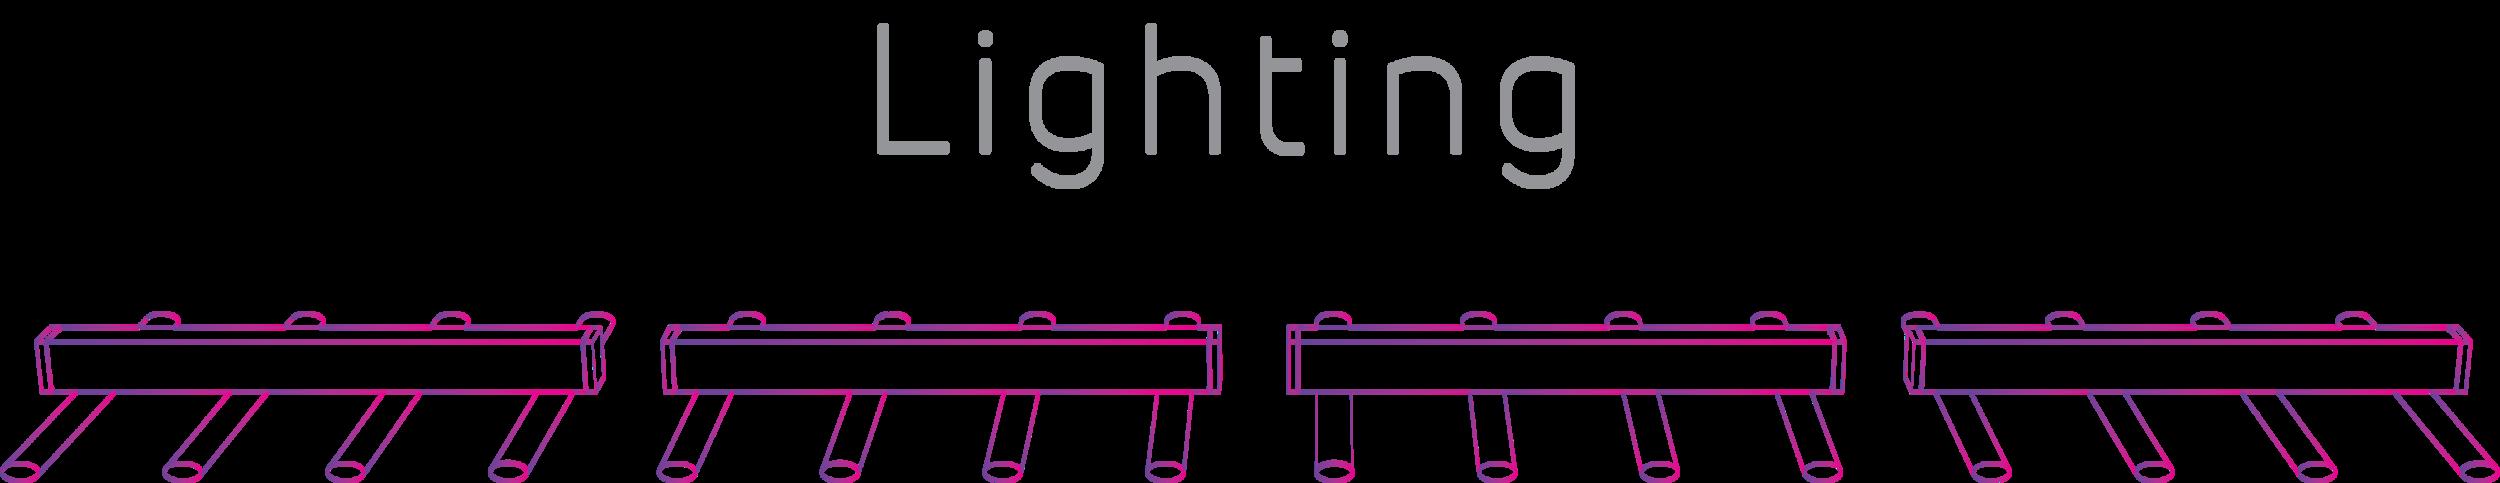 lighting header.png